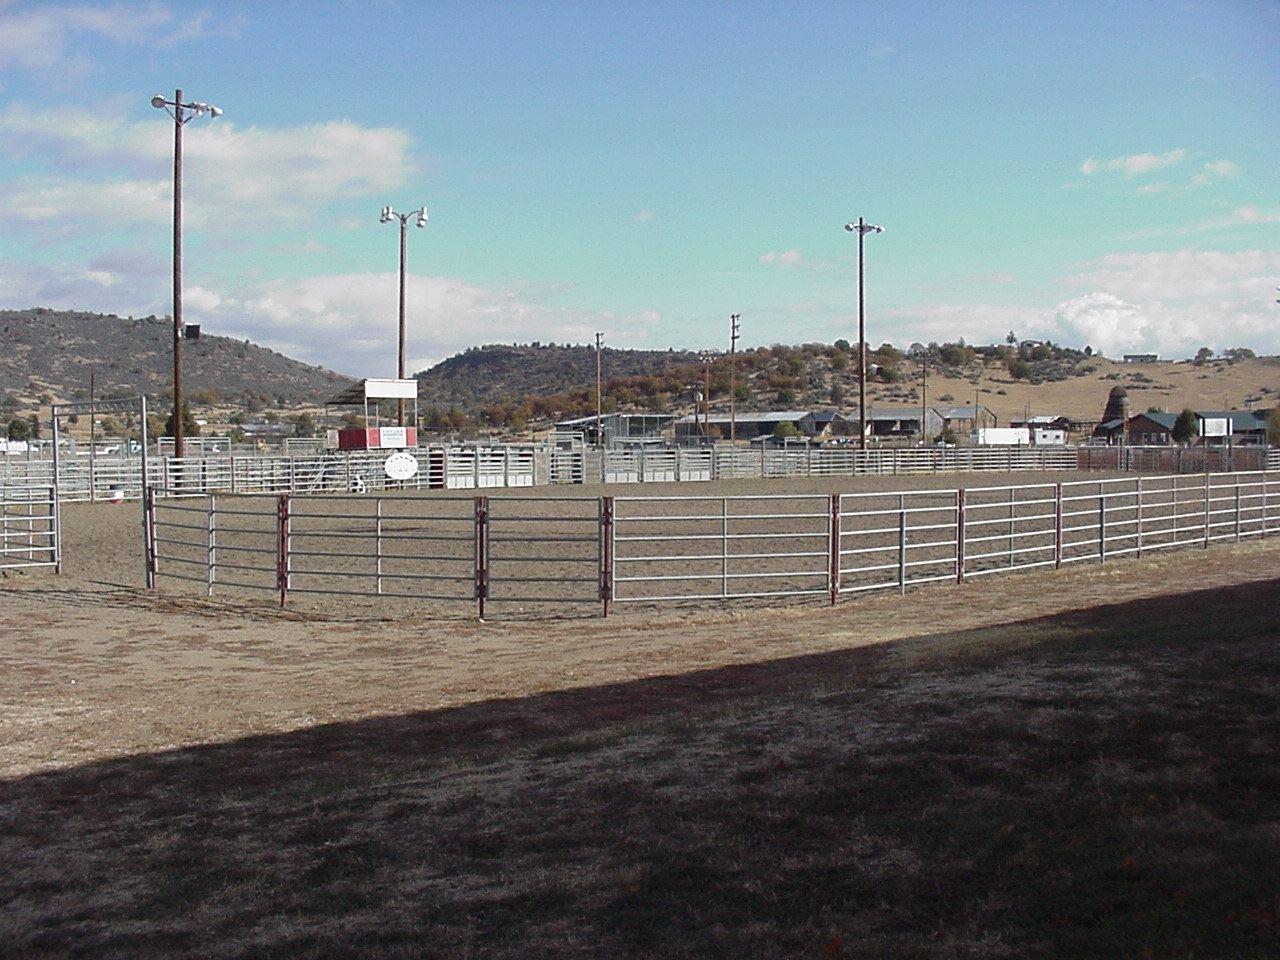 Lillard Arena